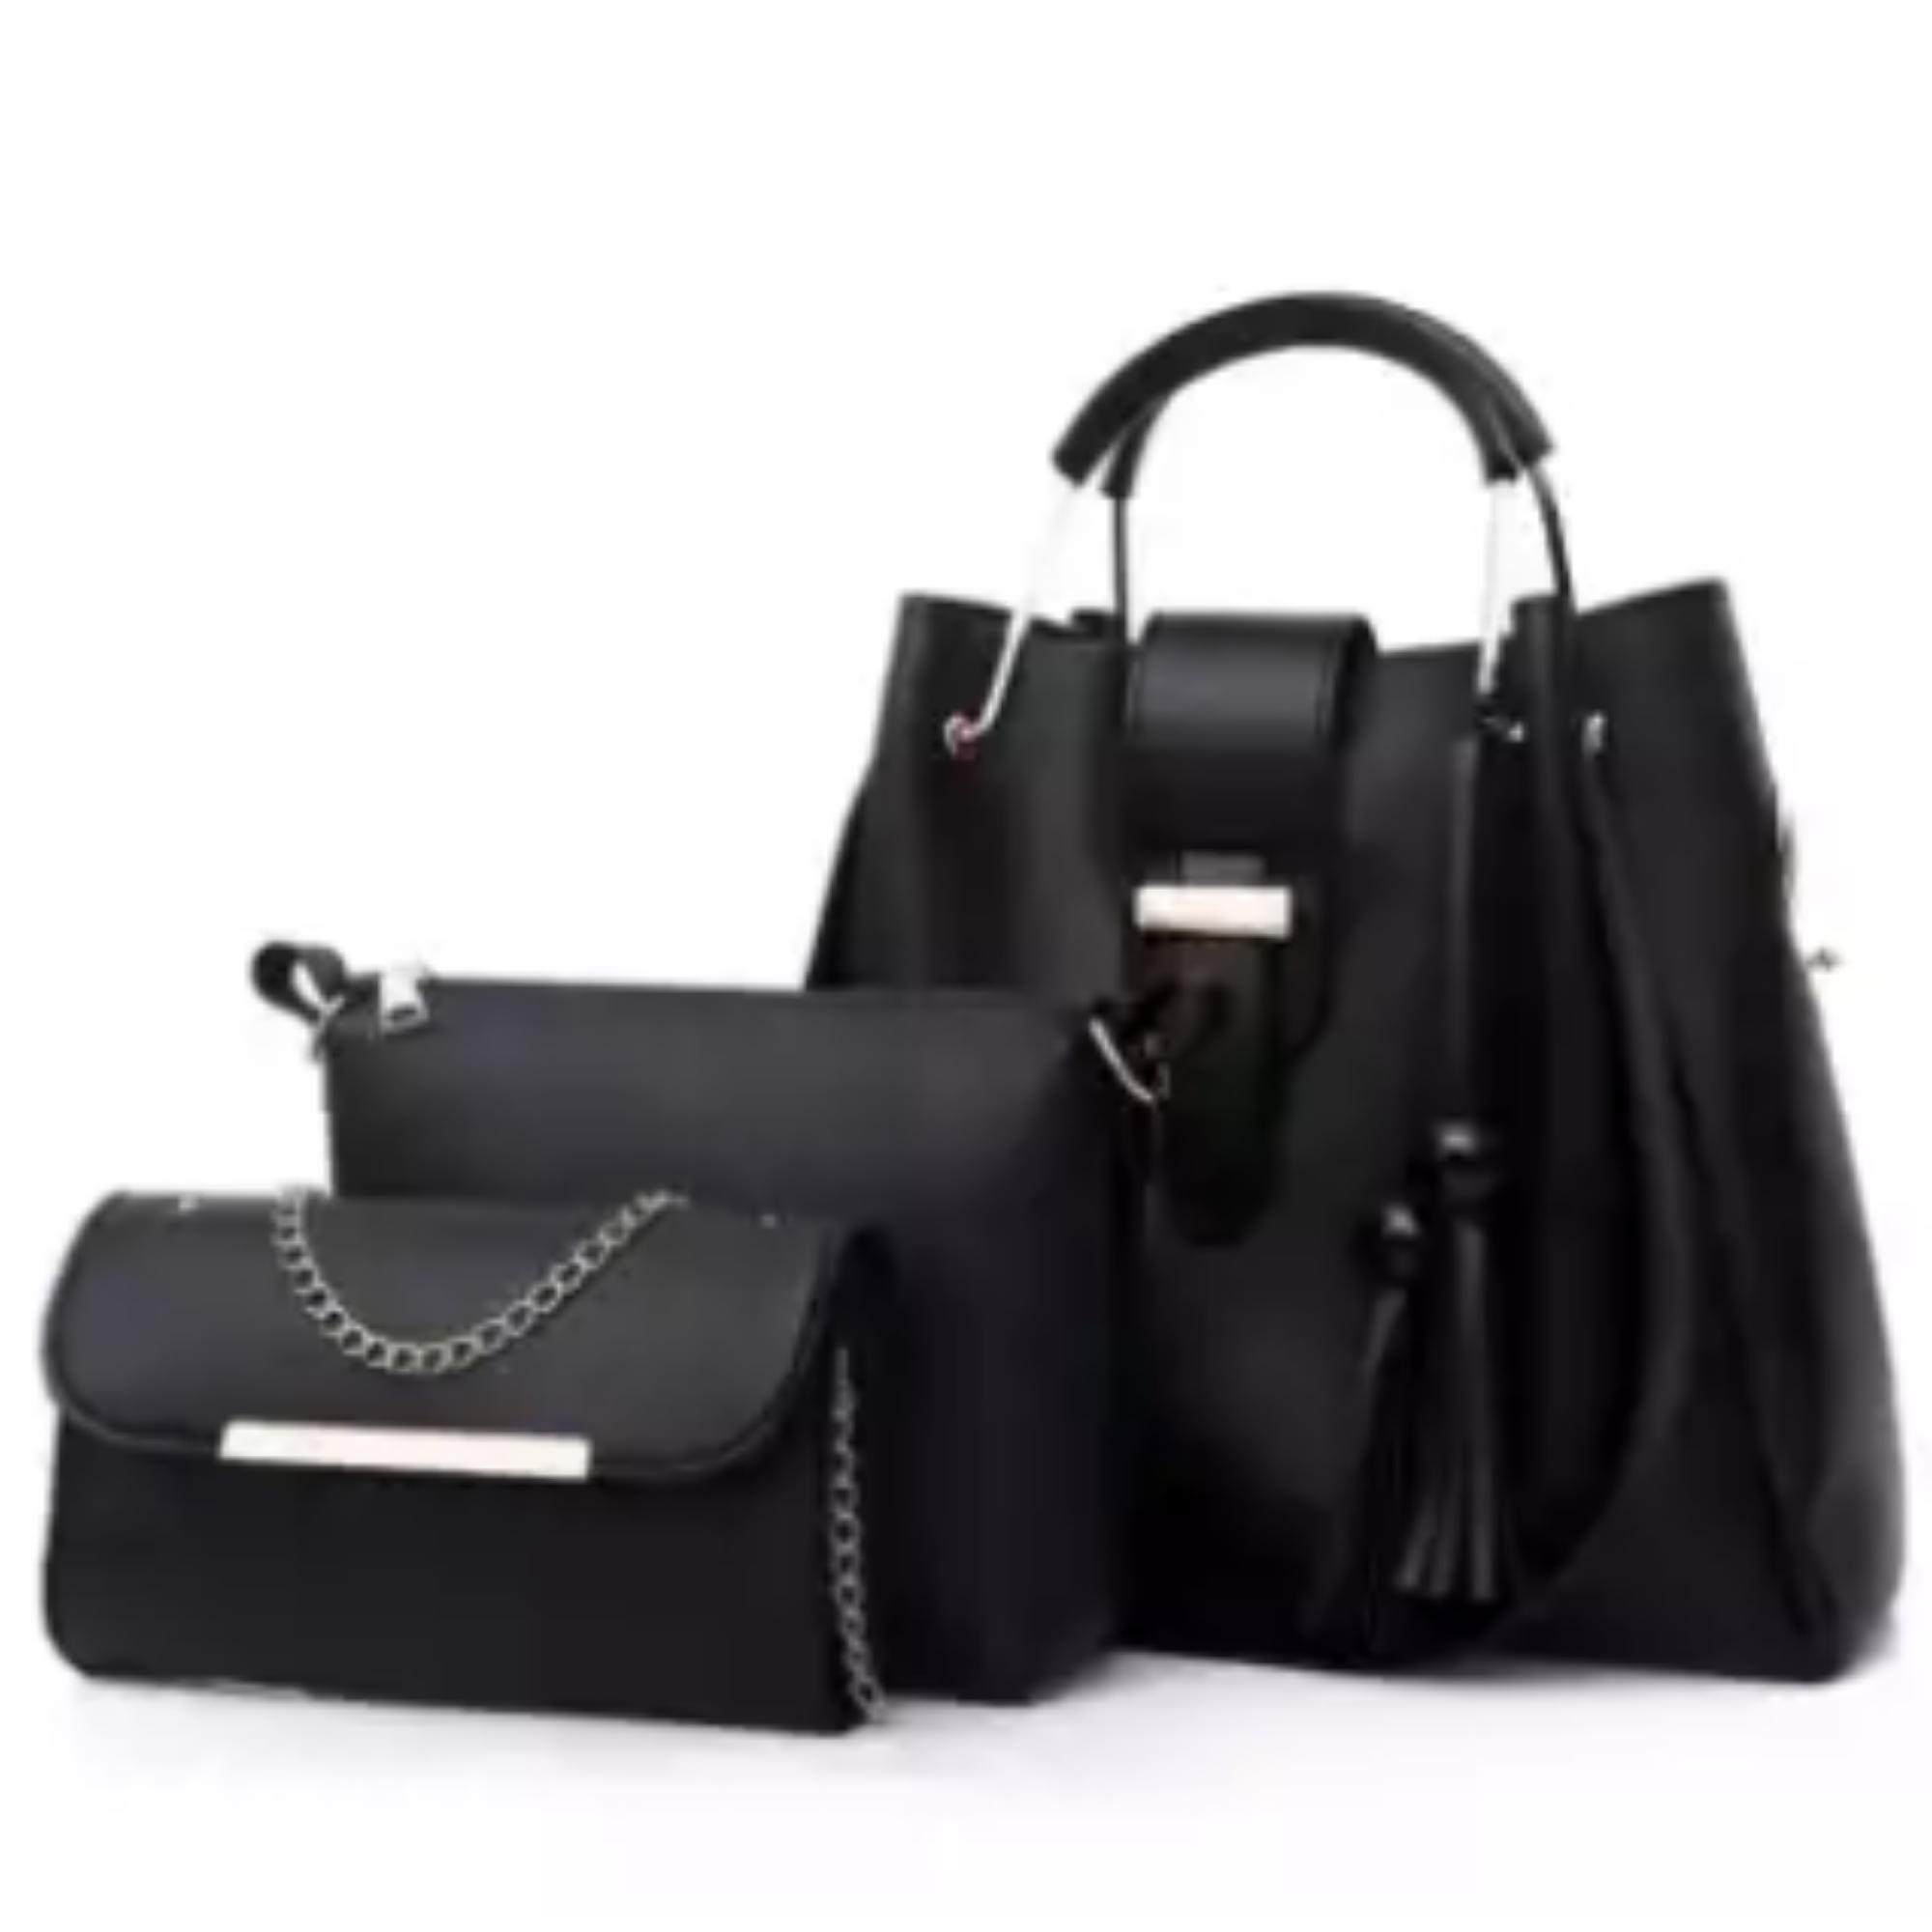 3Pcs PU Leather Ladies Hand Bags Set Handbags for Women Fashionable New Style Tote Bags Shoulder Bag Top Handle Satchel Purse Set 3pcs